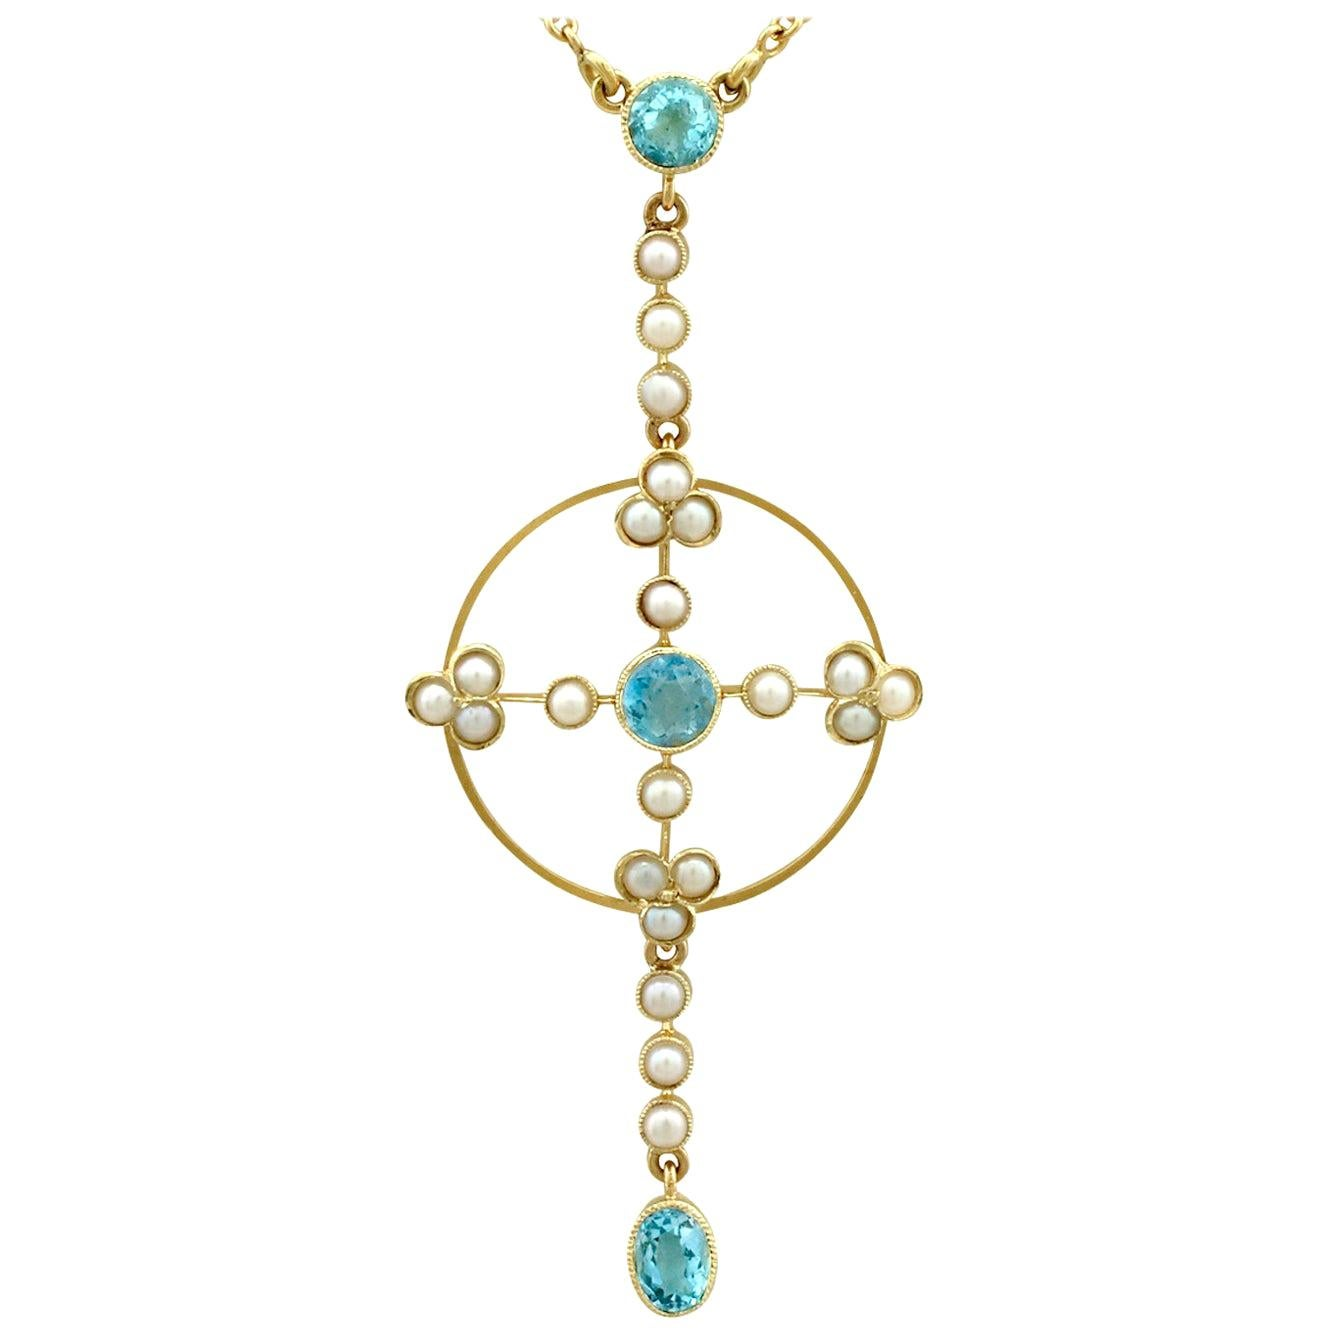 Antique Victorian Aquamarine and Pearl Yellow Gold Pendant, circa 1890